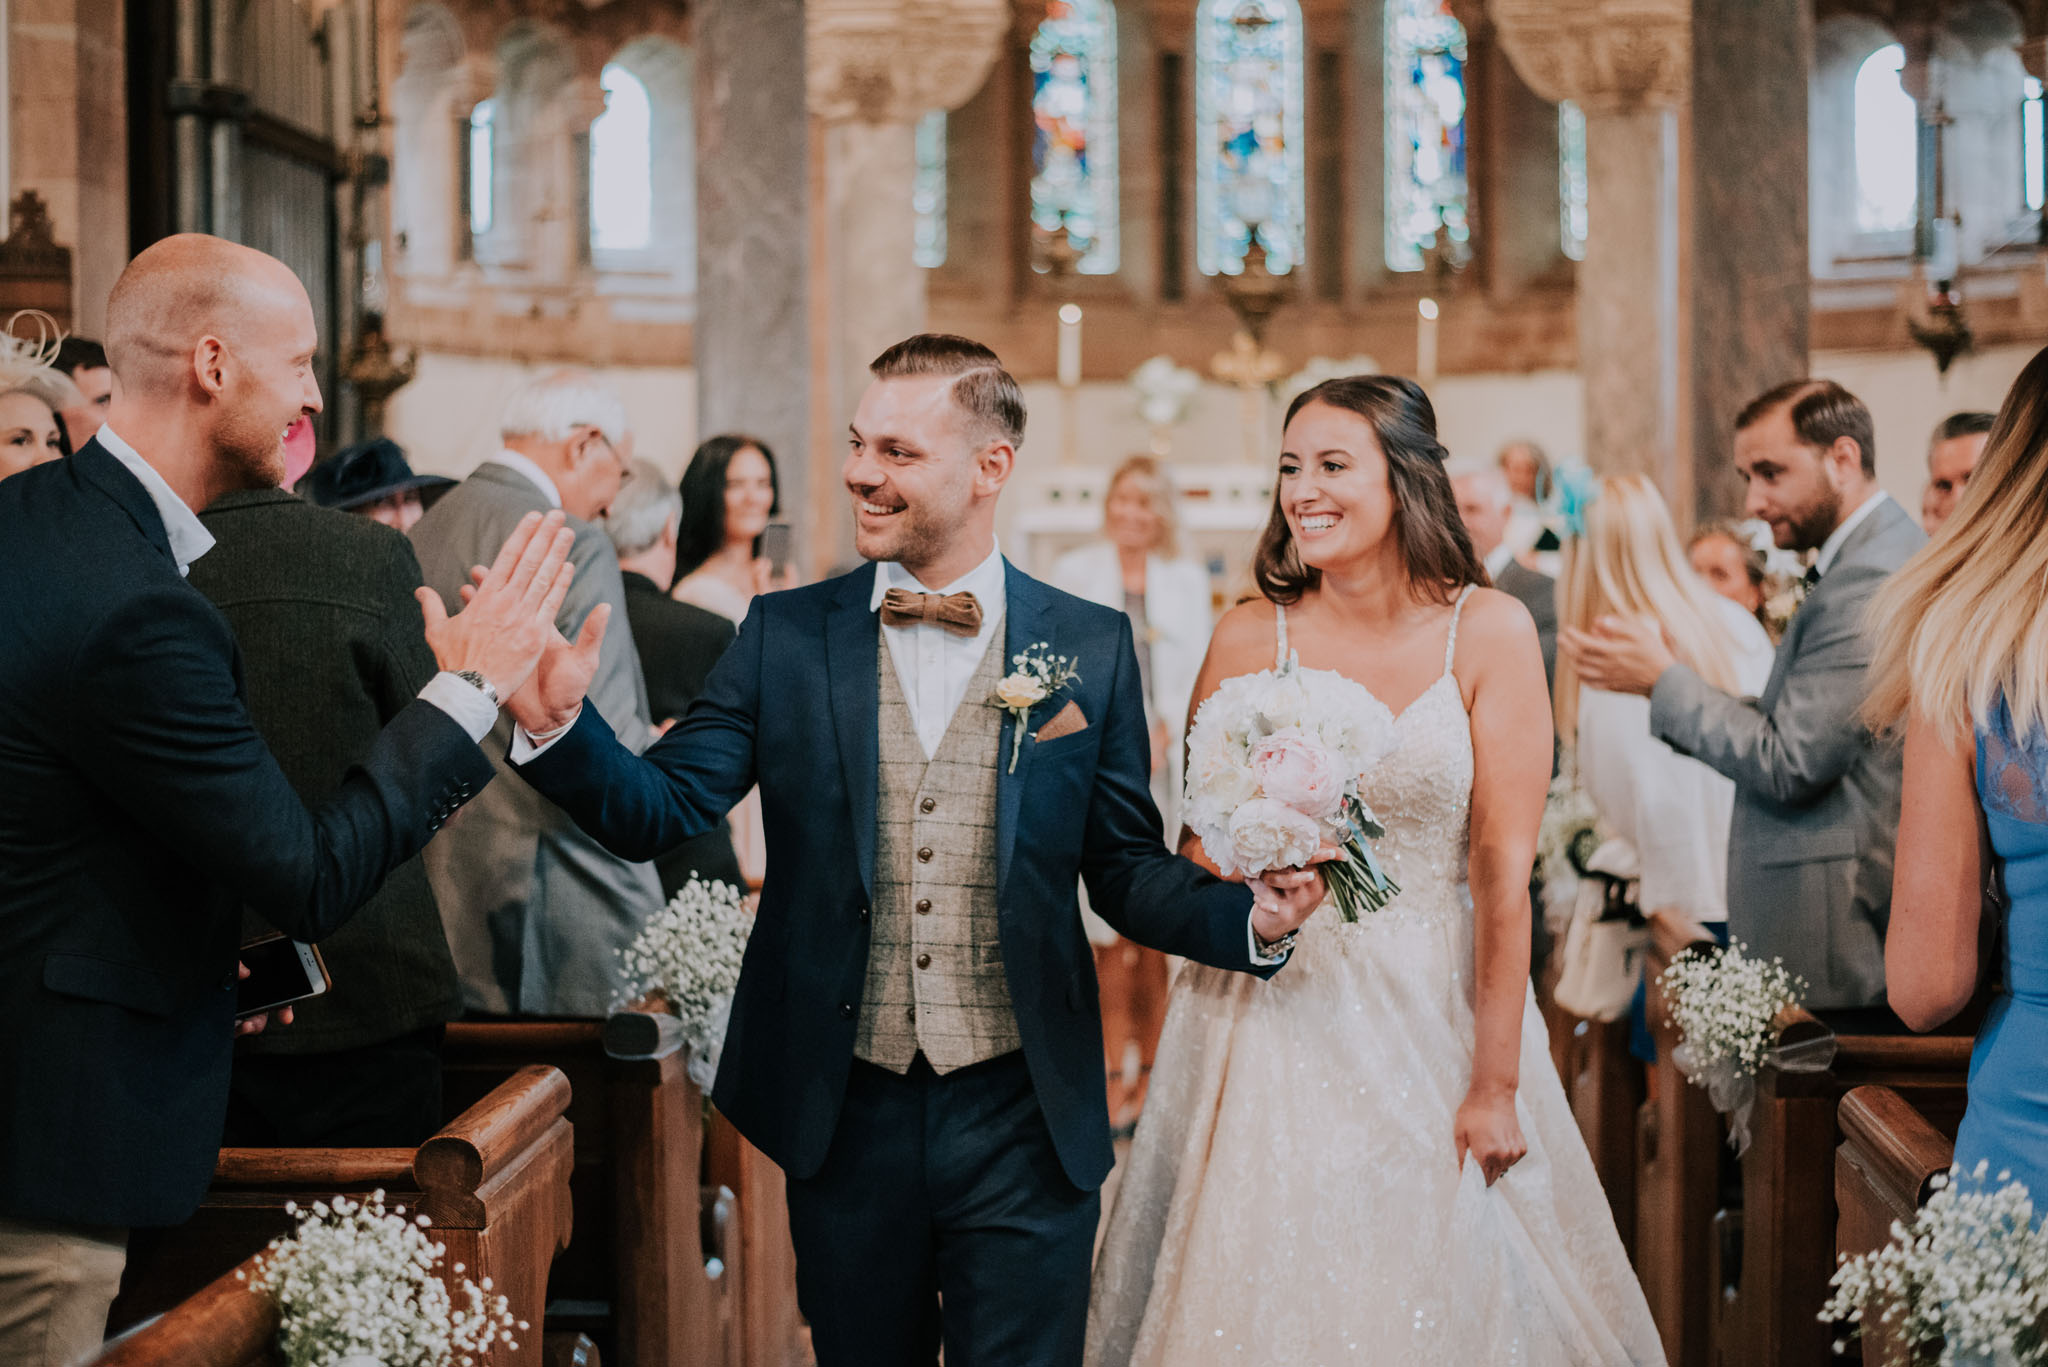 wedding-photographer-glewstone-court-hereford-scott-stockwell-photography227.jpg